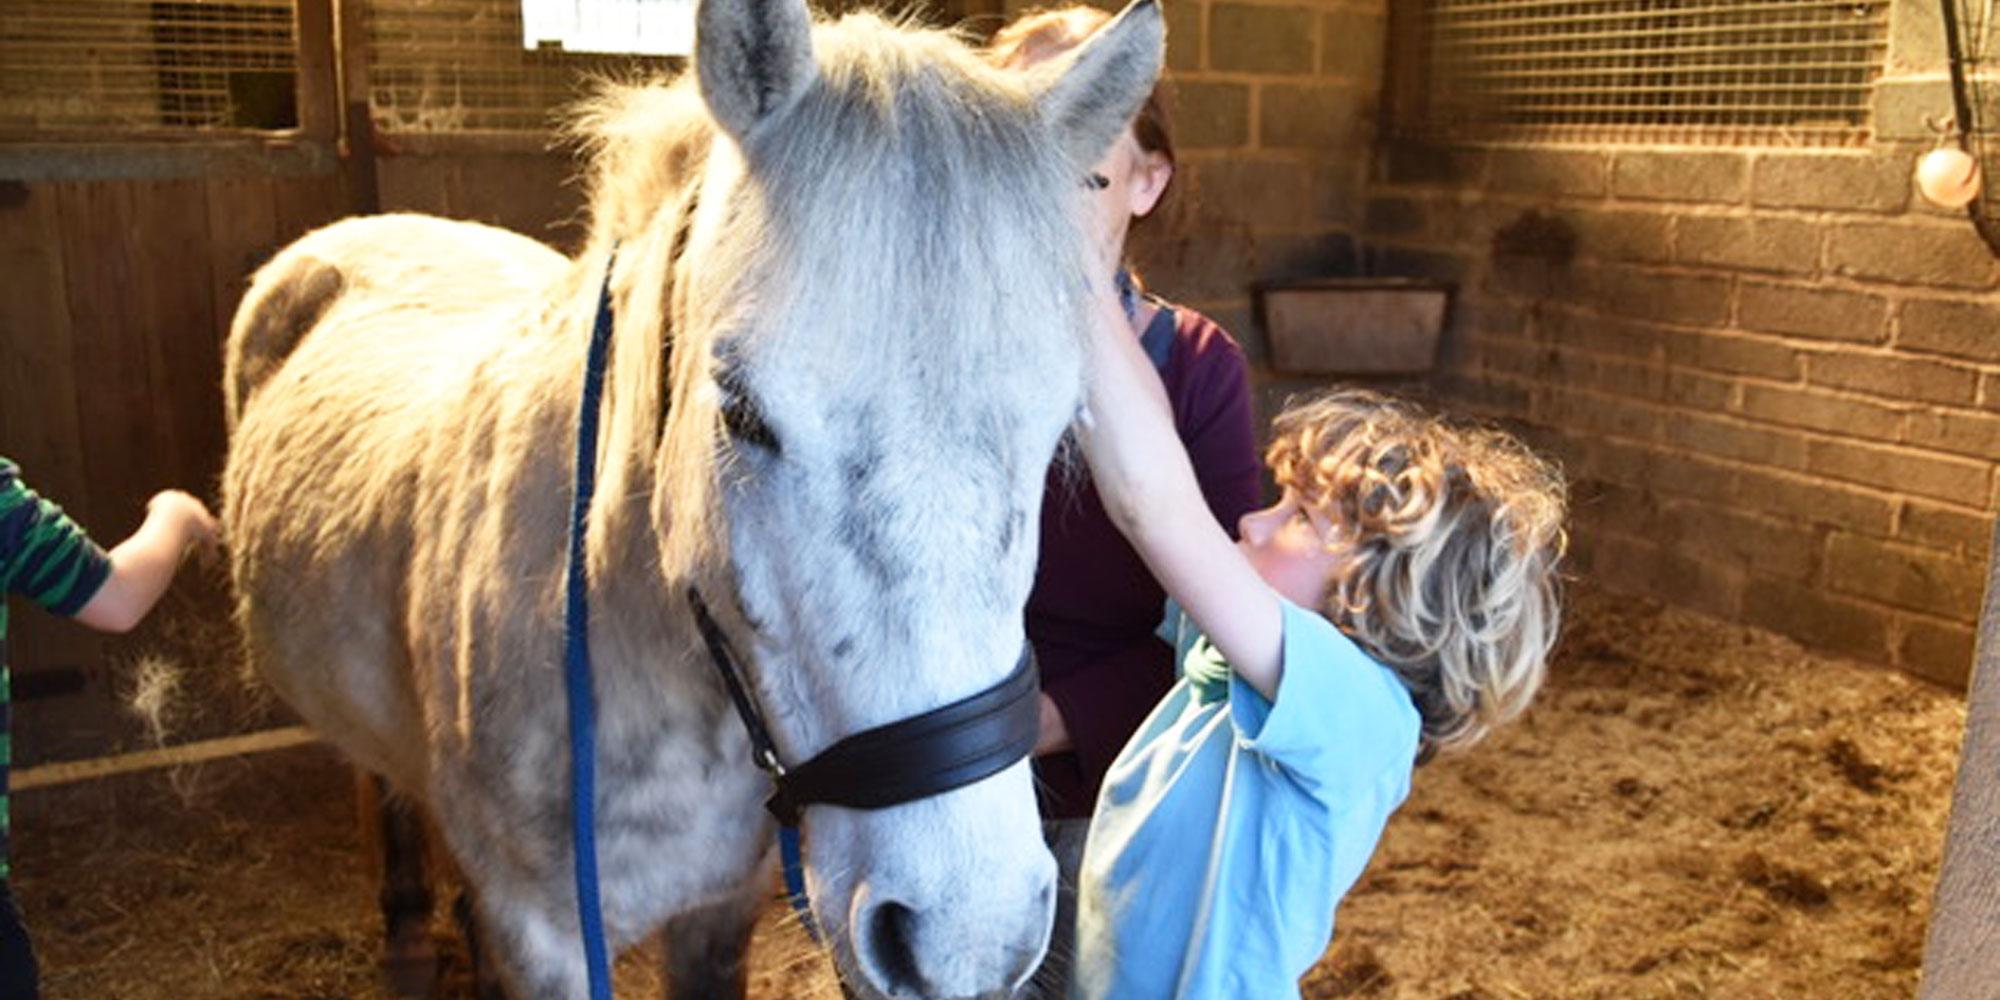 Children with horse